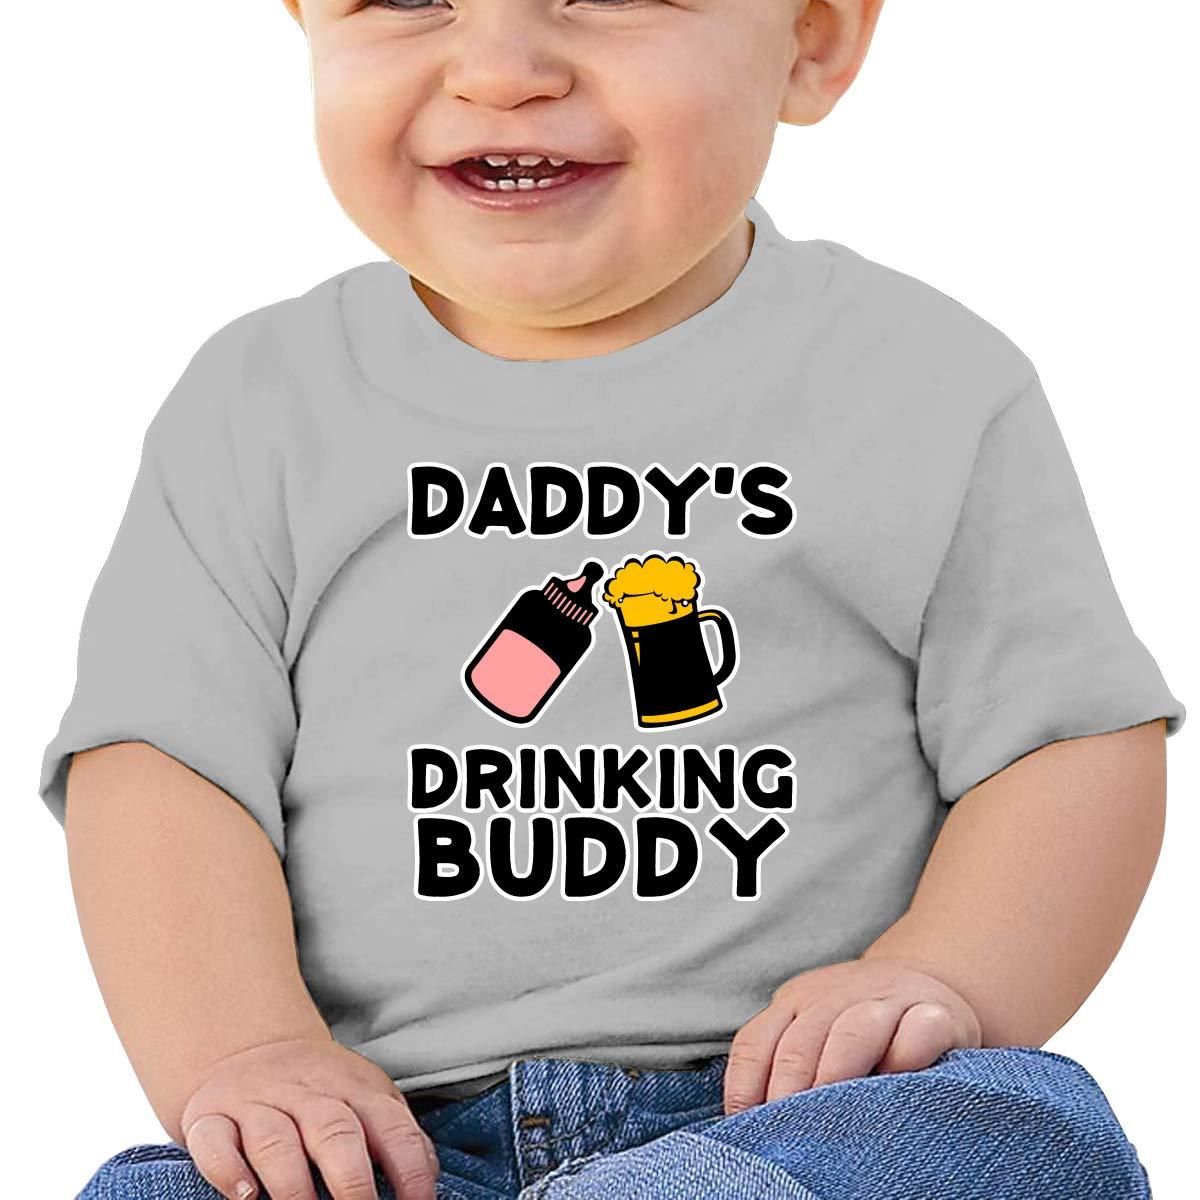 XHX403 Dad Drinking Partner Infant Kids T Shirt Cotton Tee Toddler Baby 6-18M